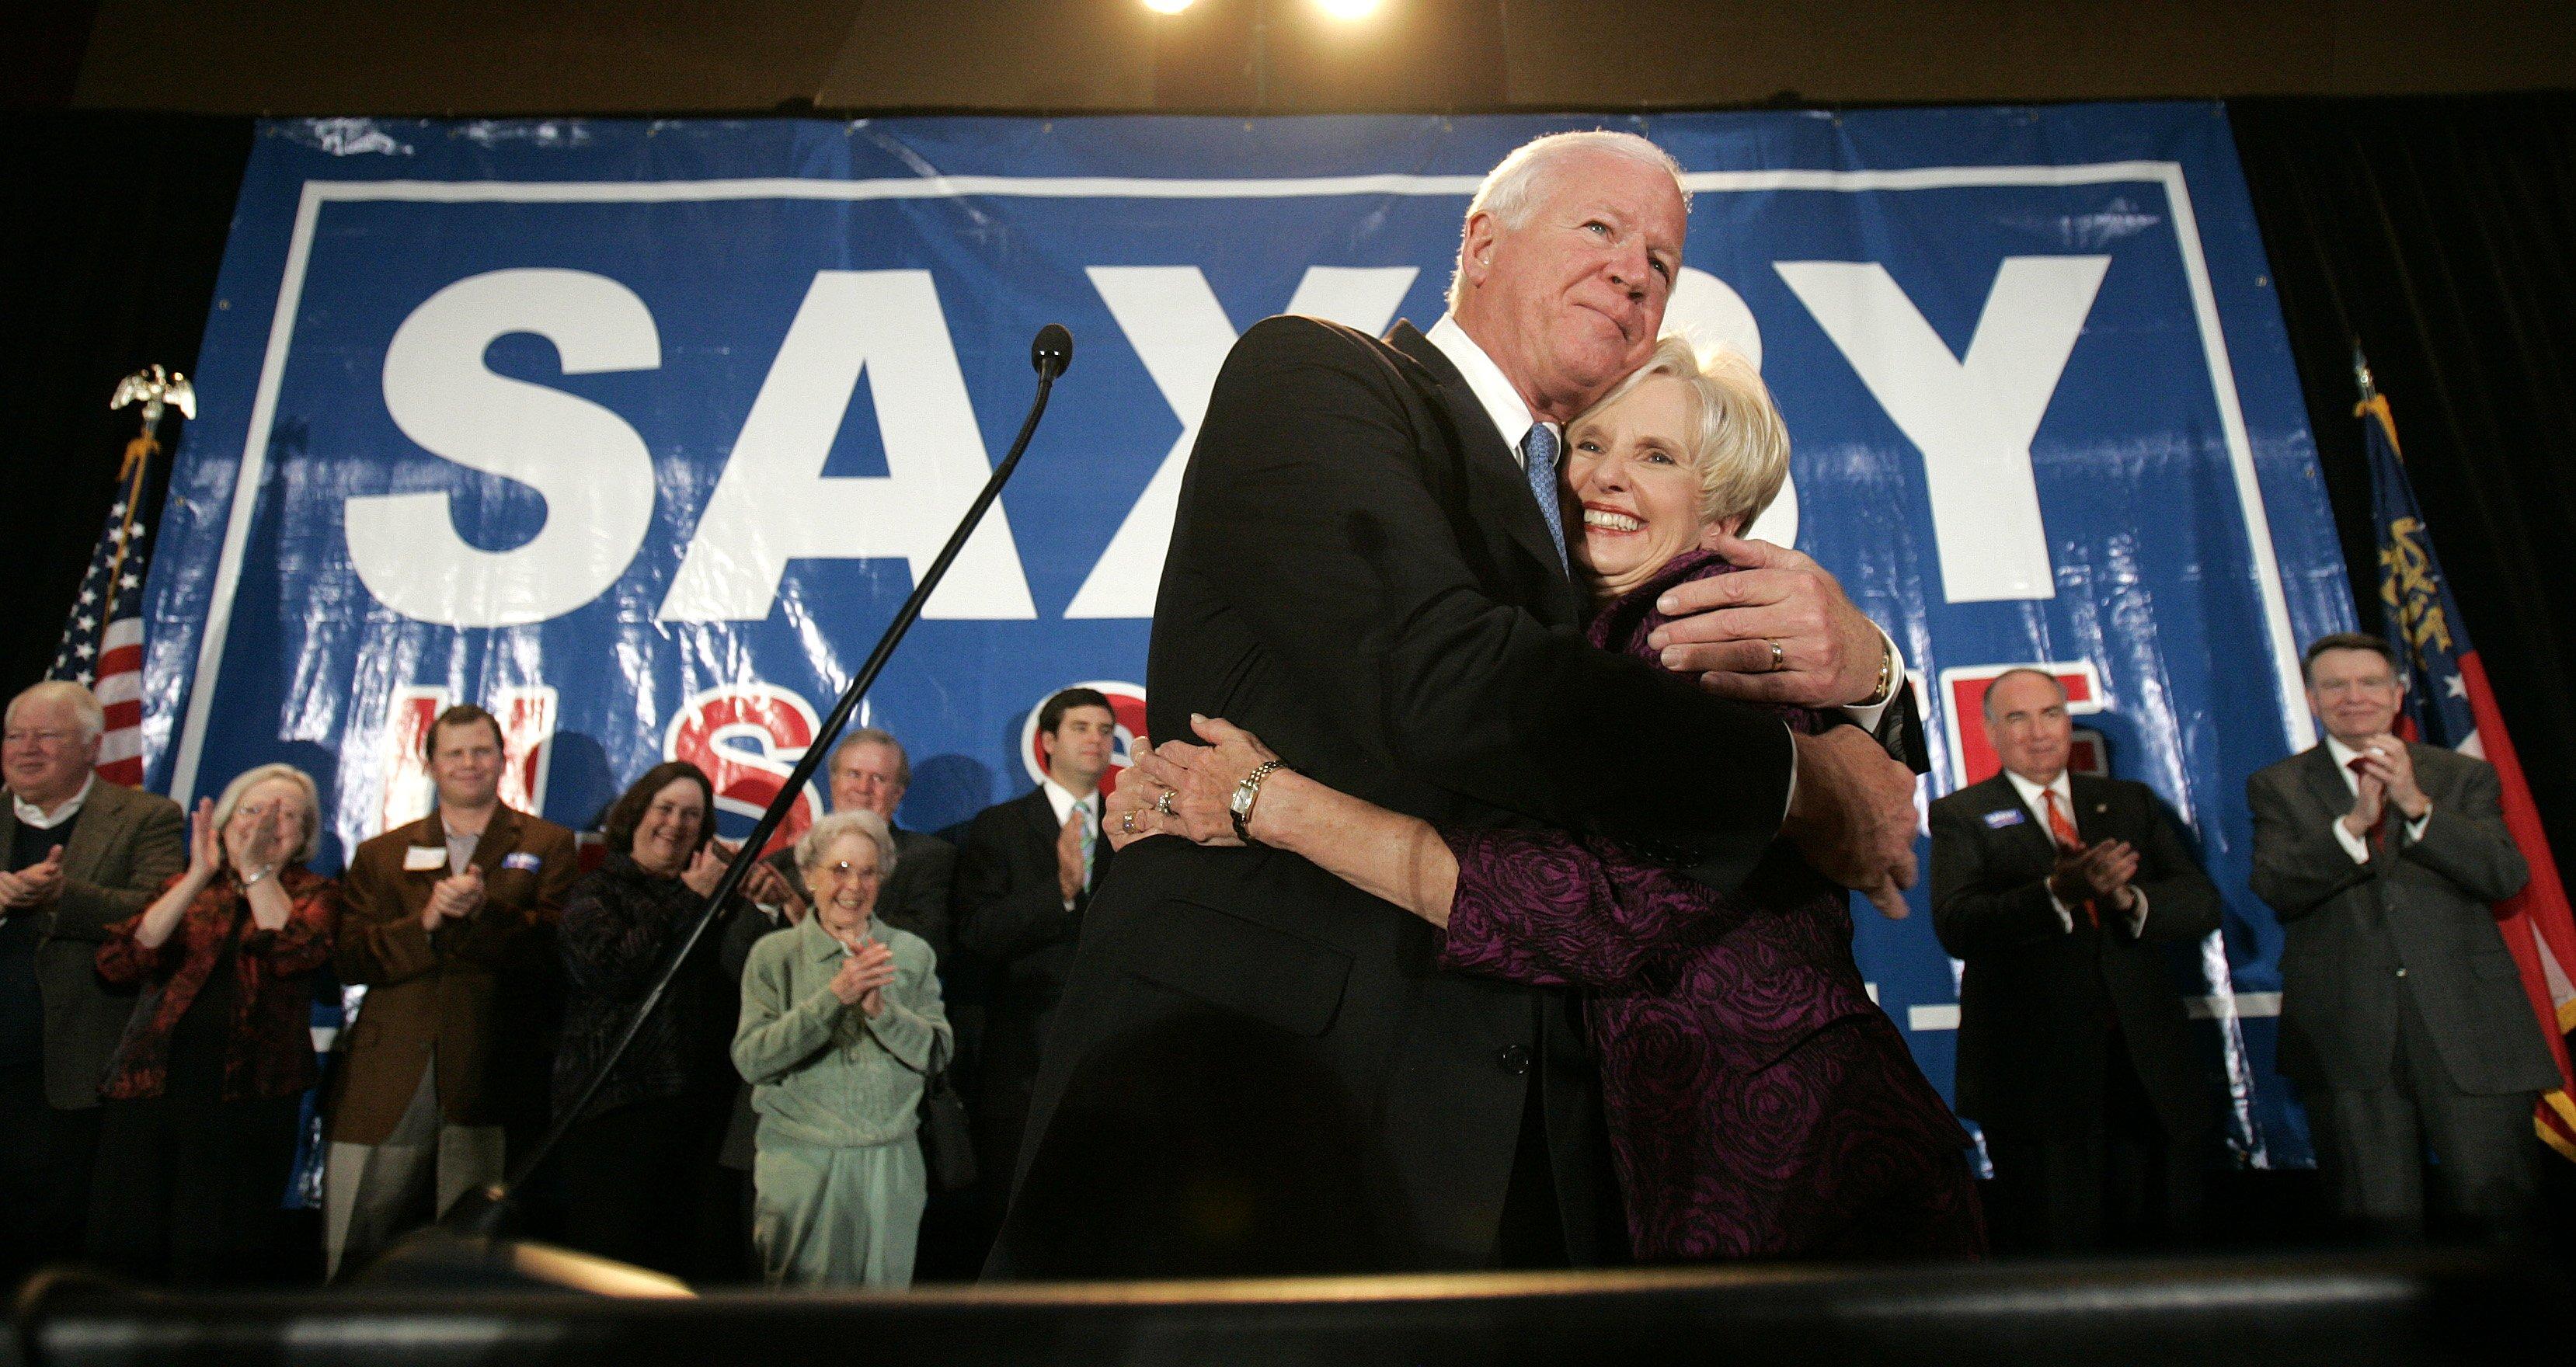 Sen Saxby Chambliss R Ga Hugs His Wife Julianne